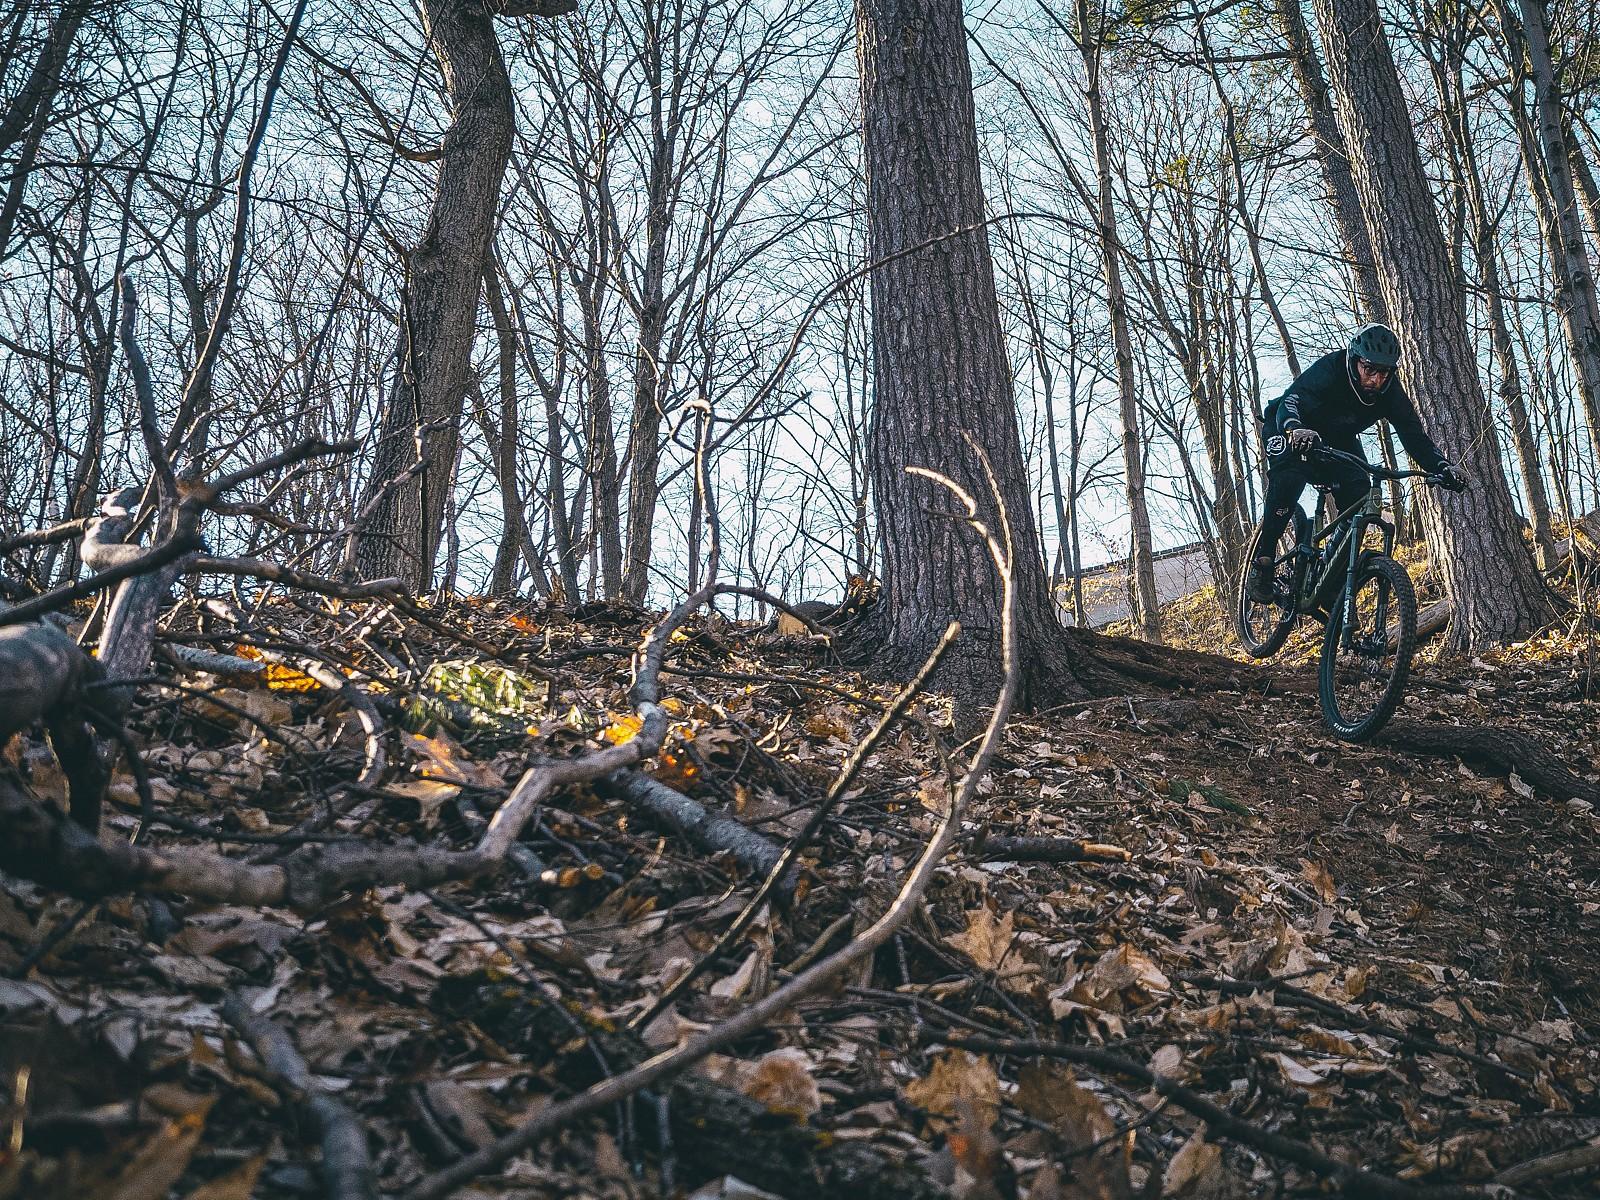 20210411  - philippemarceau - Mountain Biking Pictures - Vital MTB